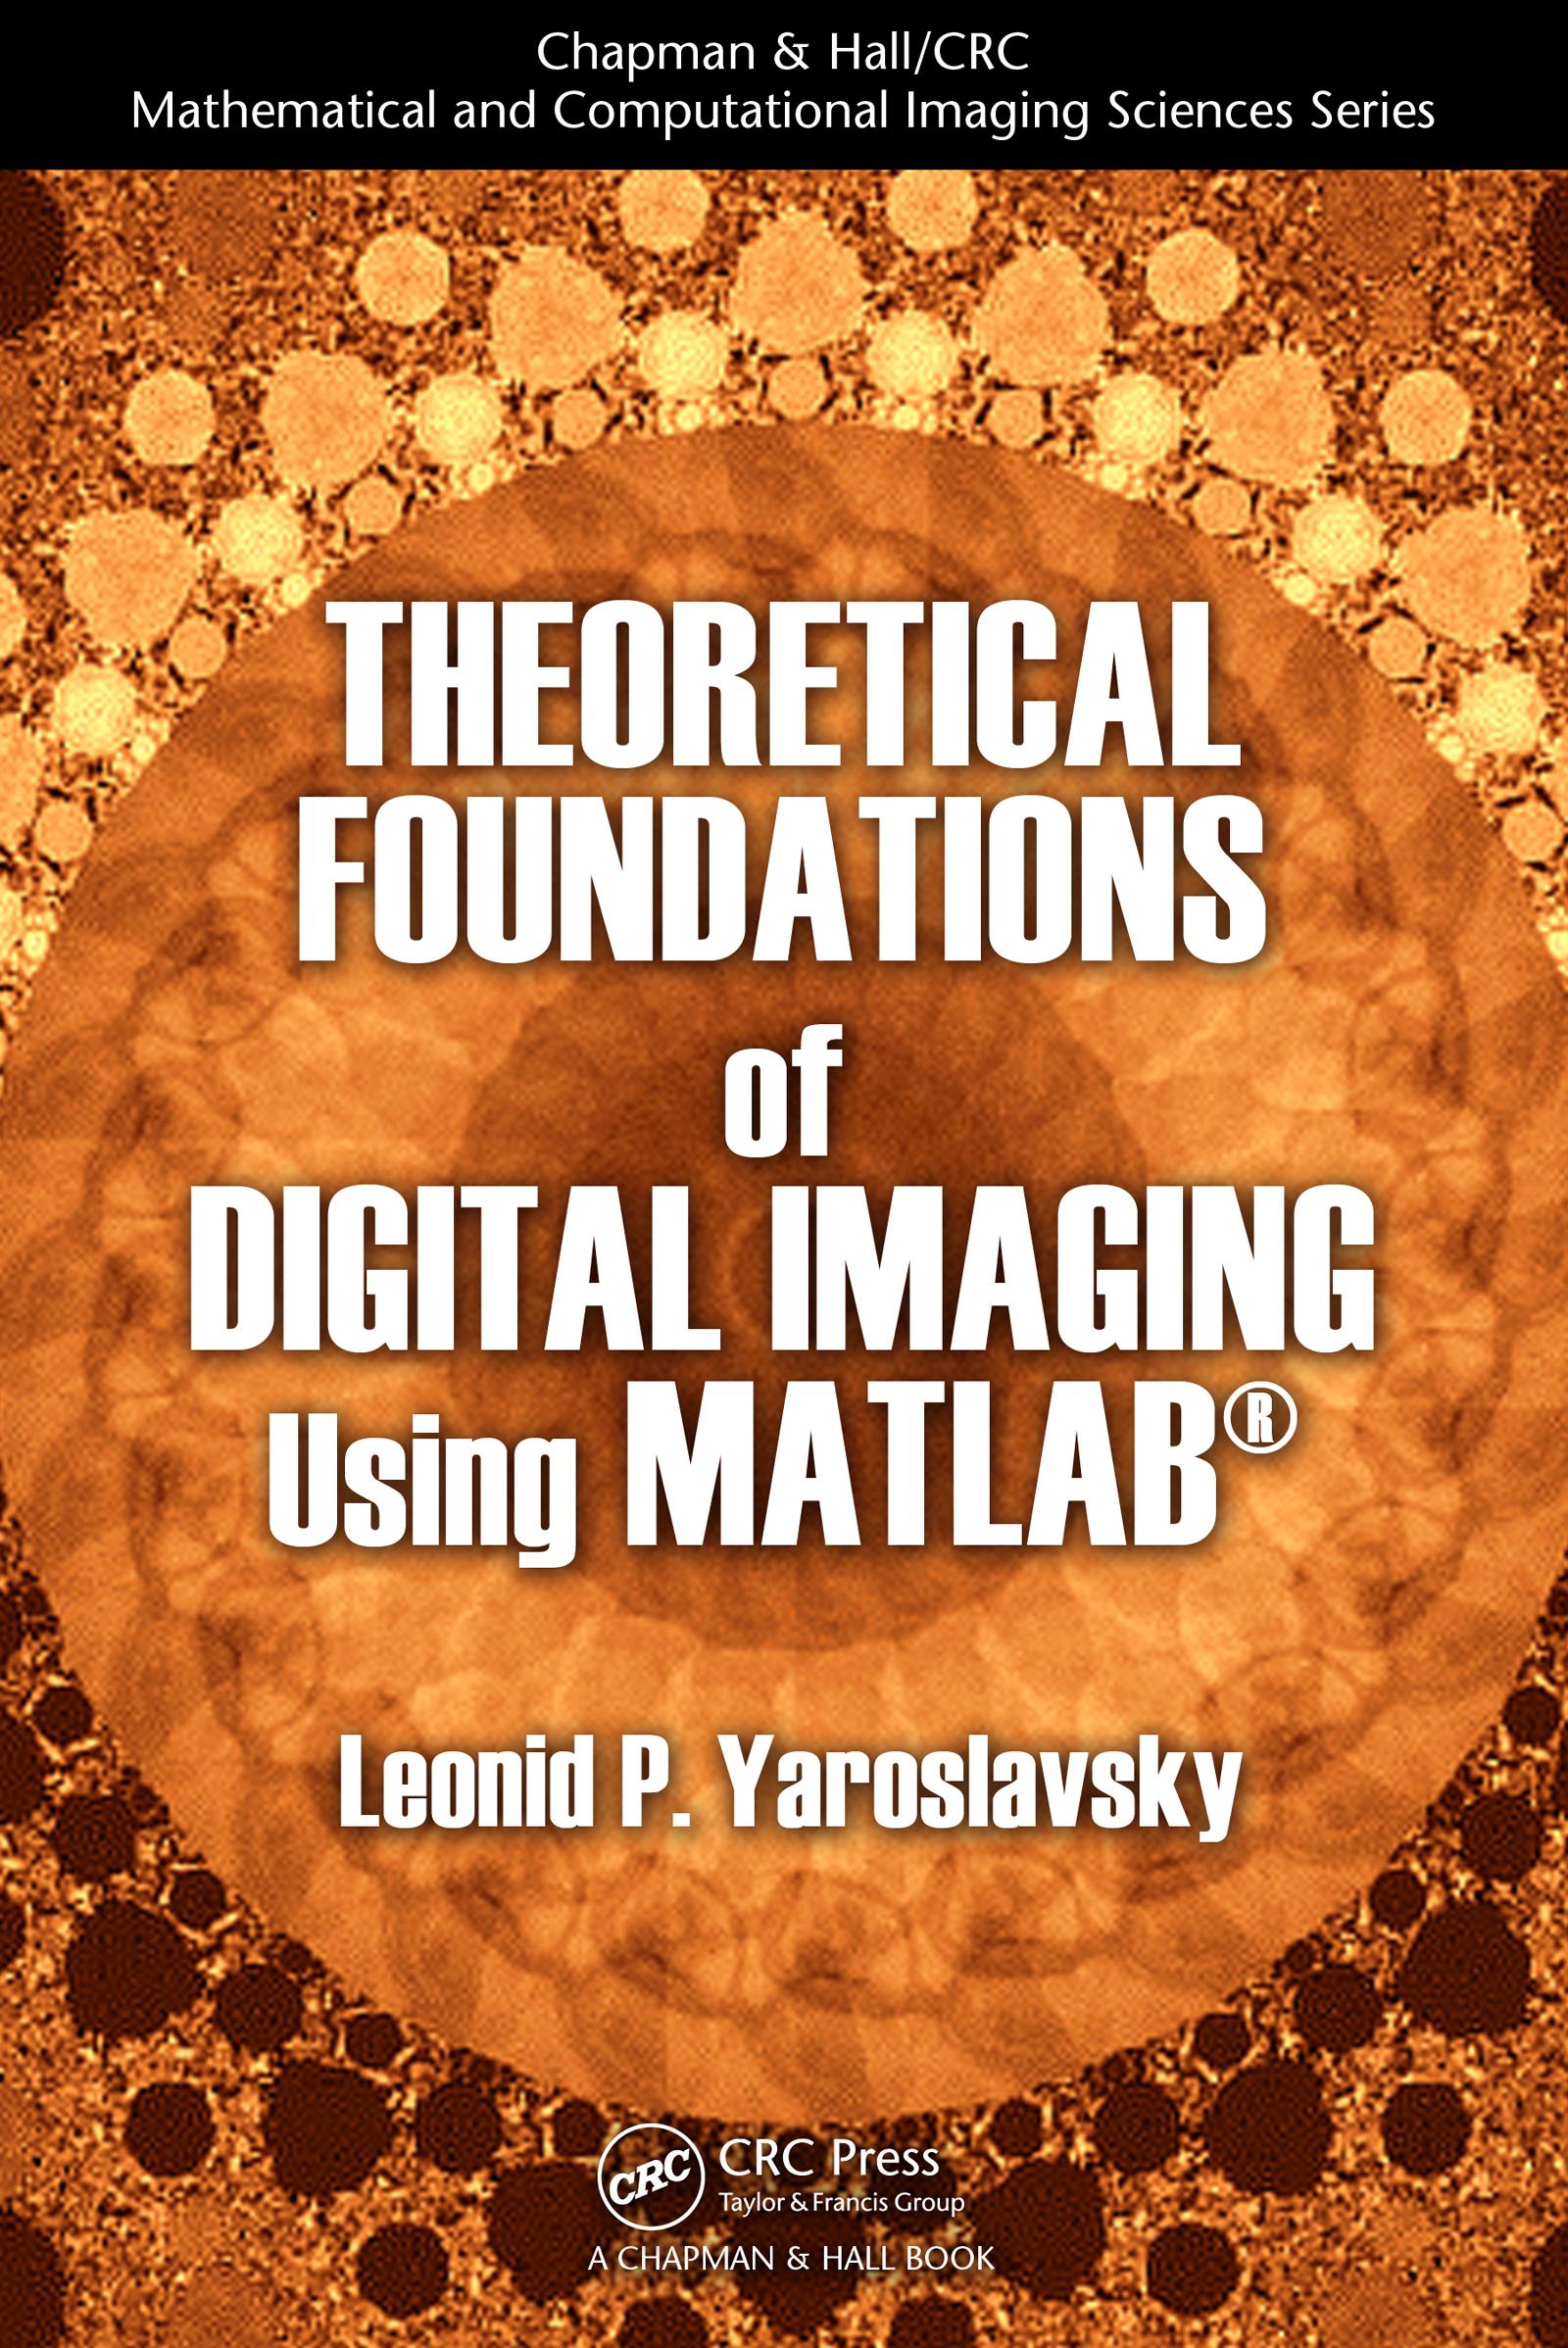 Theoretical Foundations of Digital Imaging Using MATLAB